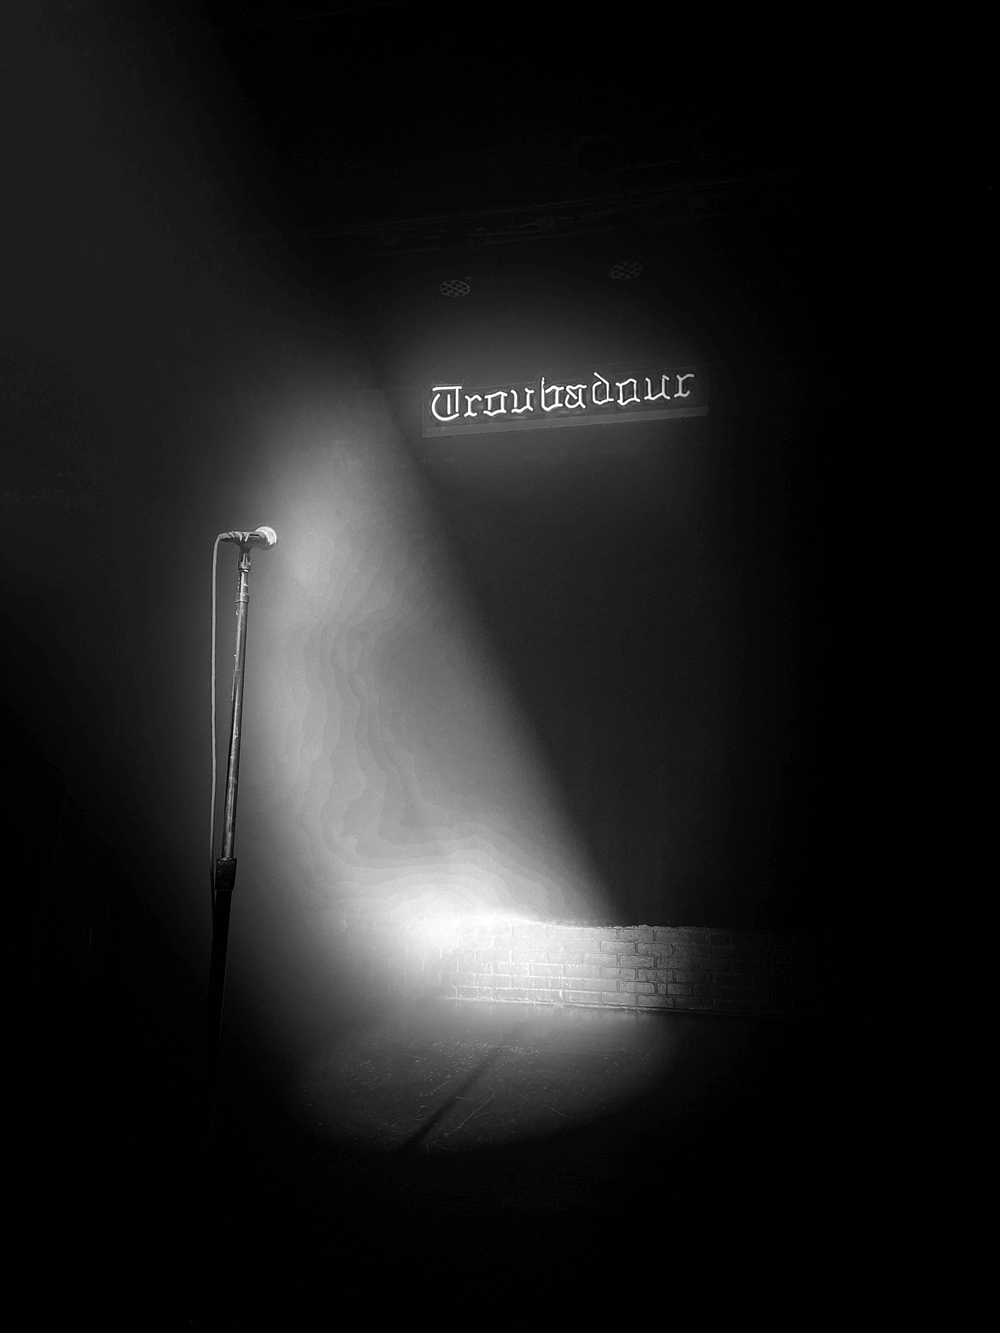 troubadour stage